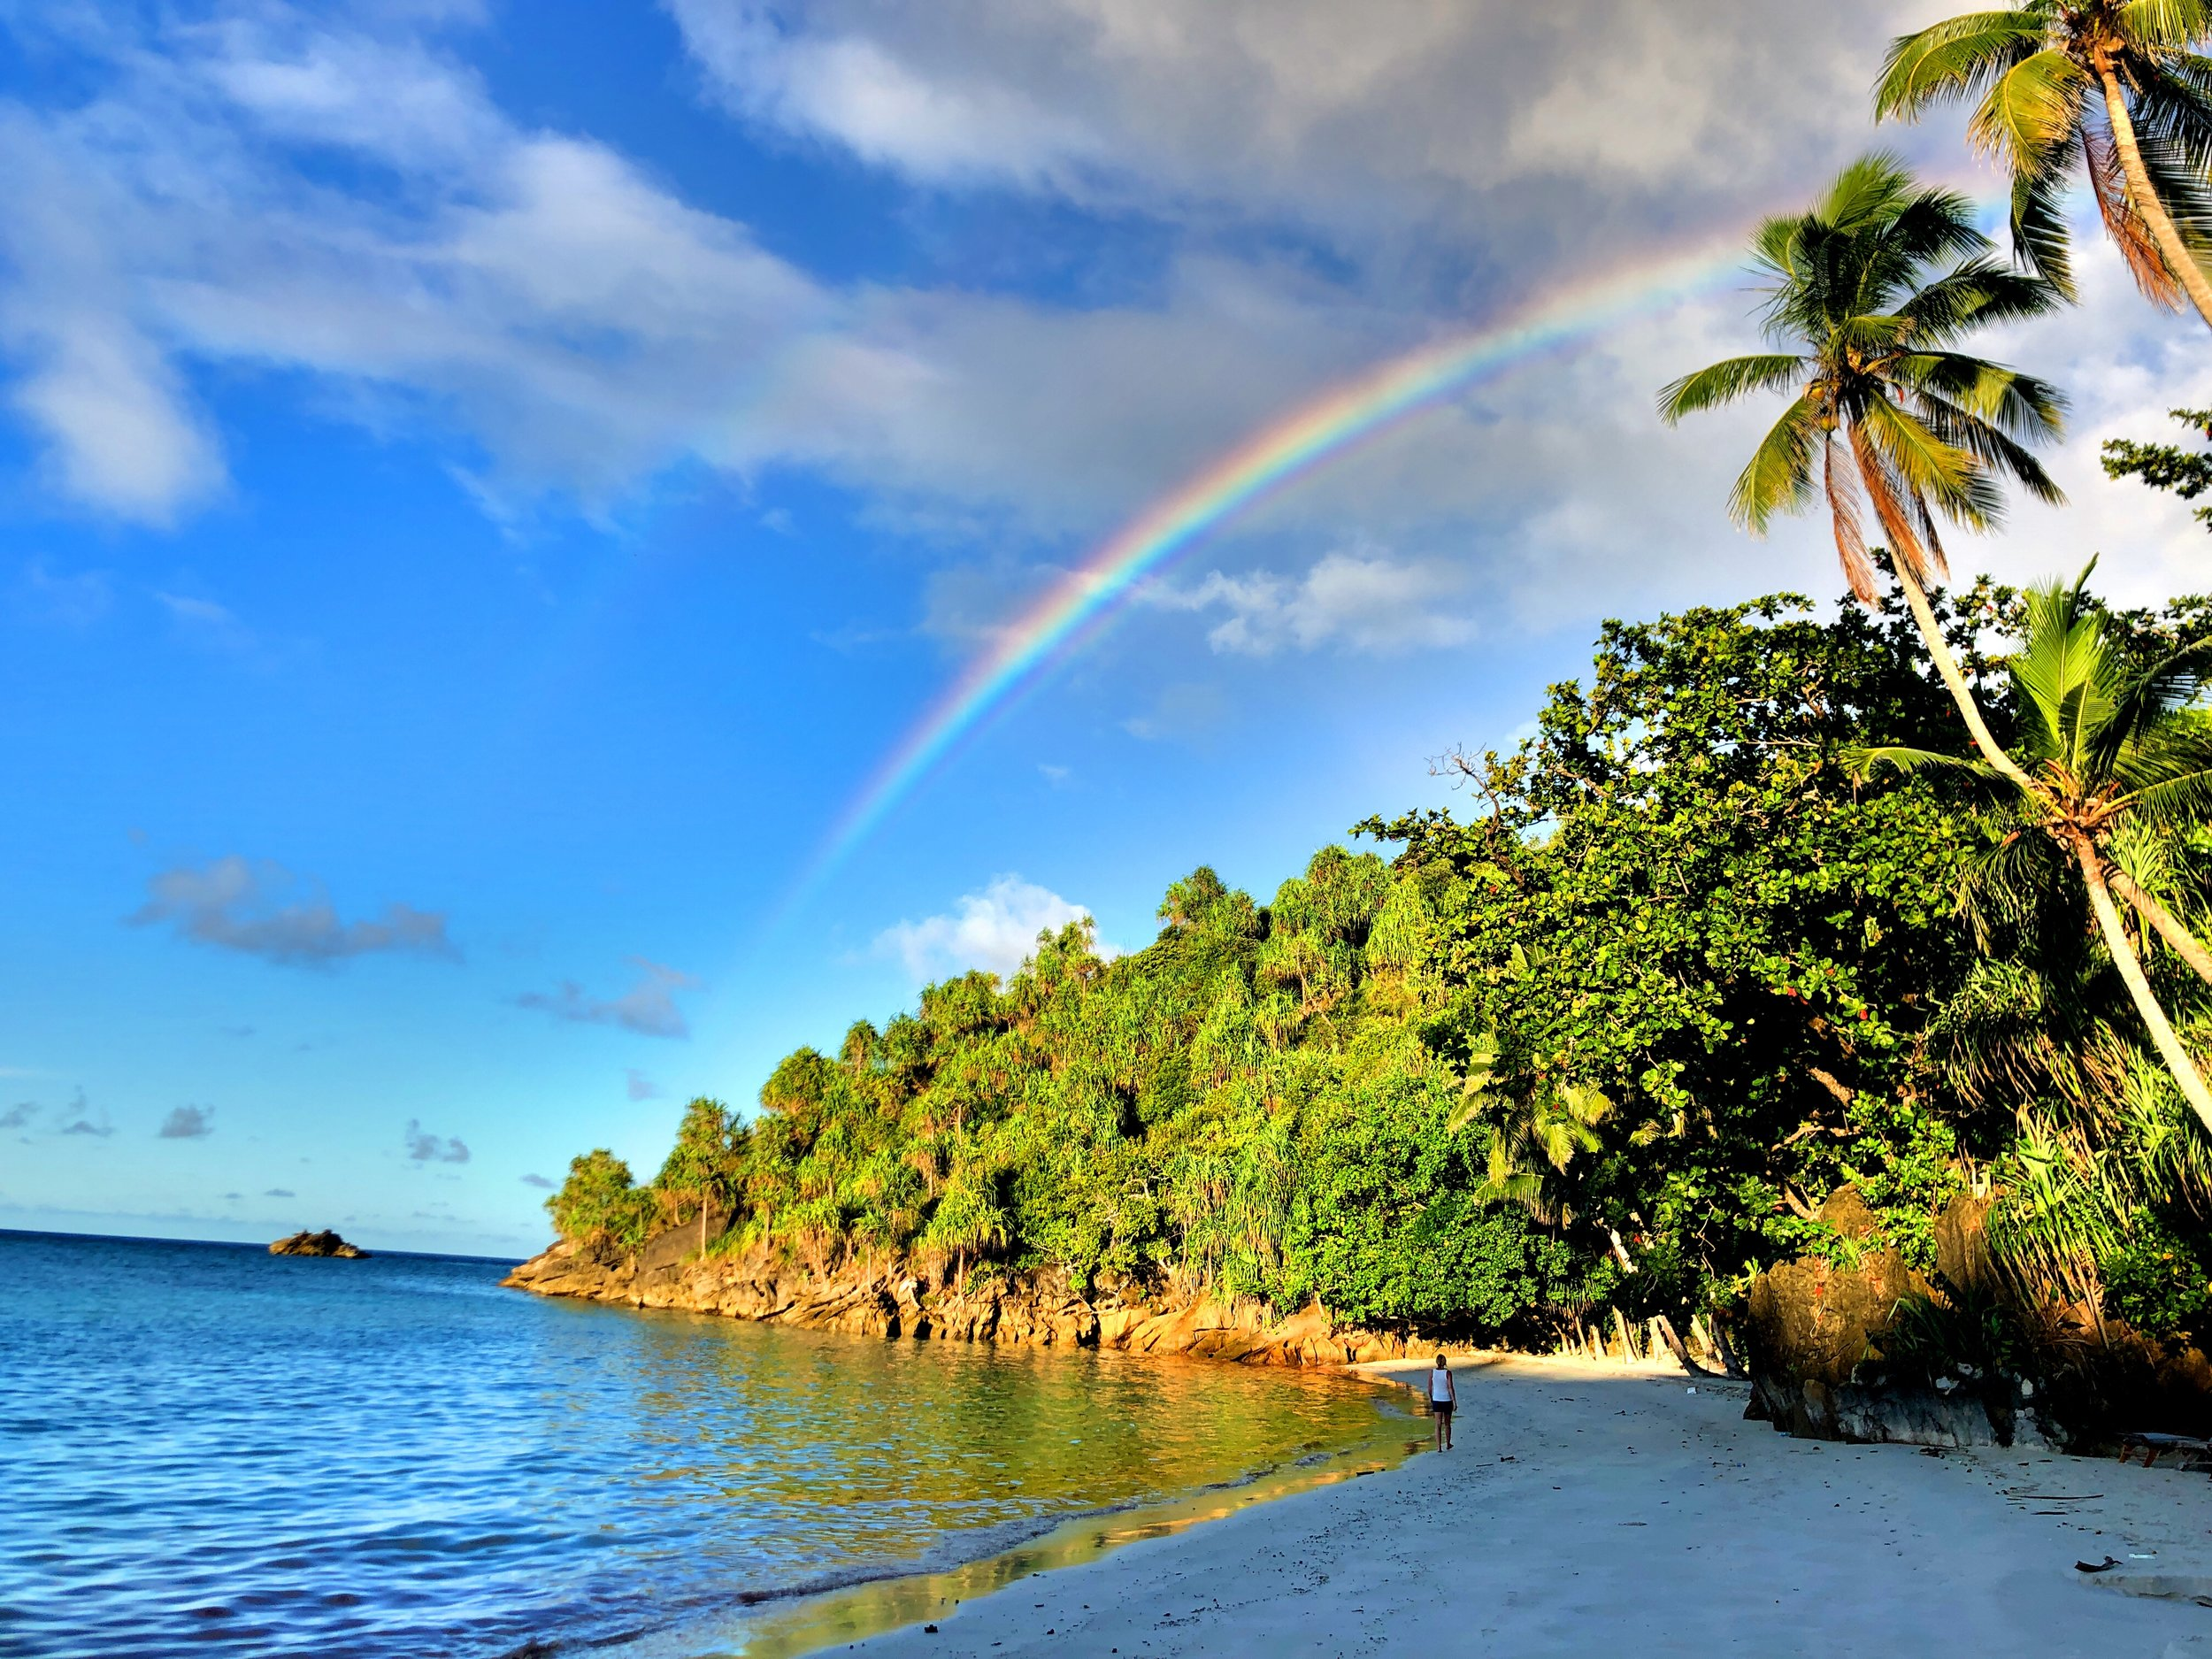 1. Rainbow.JPG